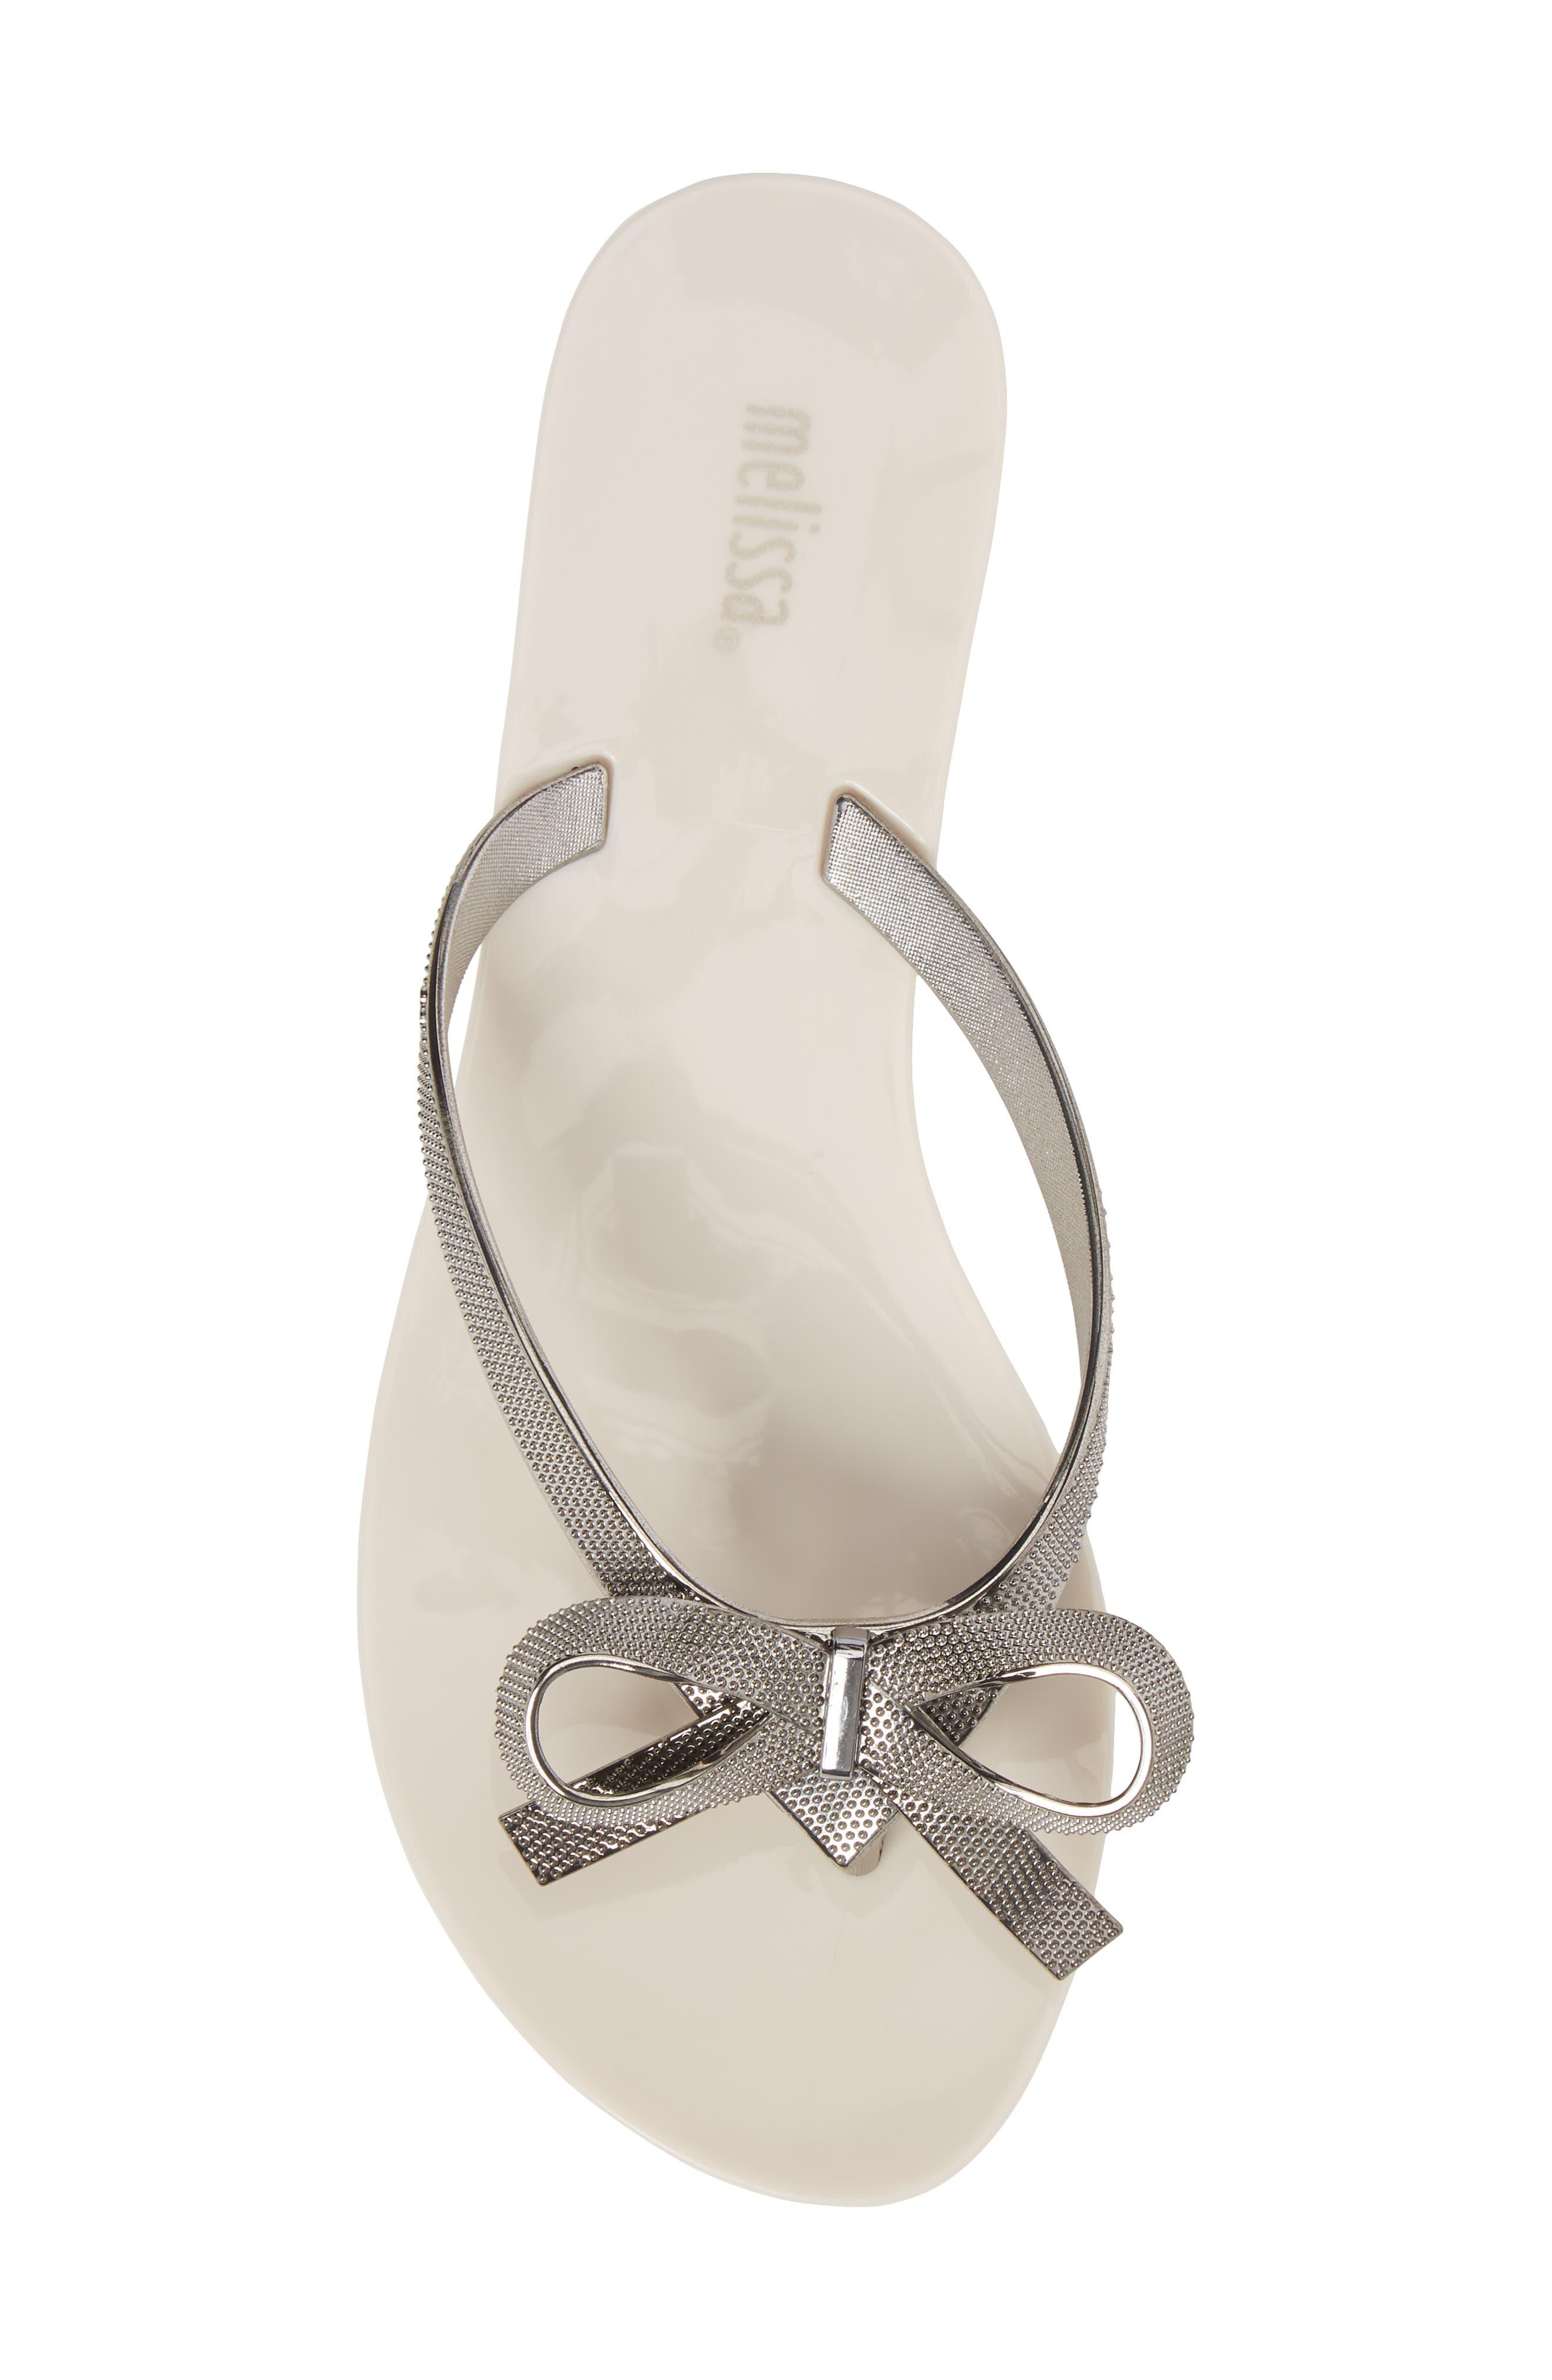 Harmonic Bow Chrome II Sandal,                             Alternate thumbnail 5, color,                             040